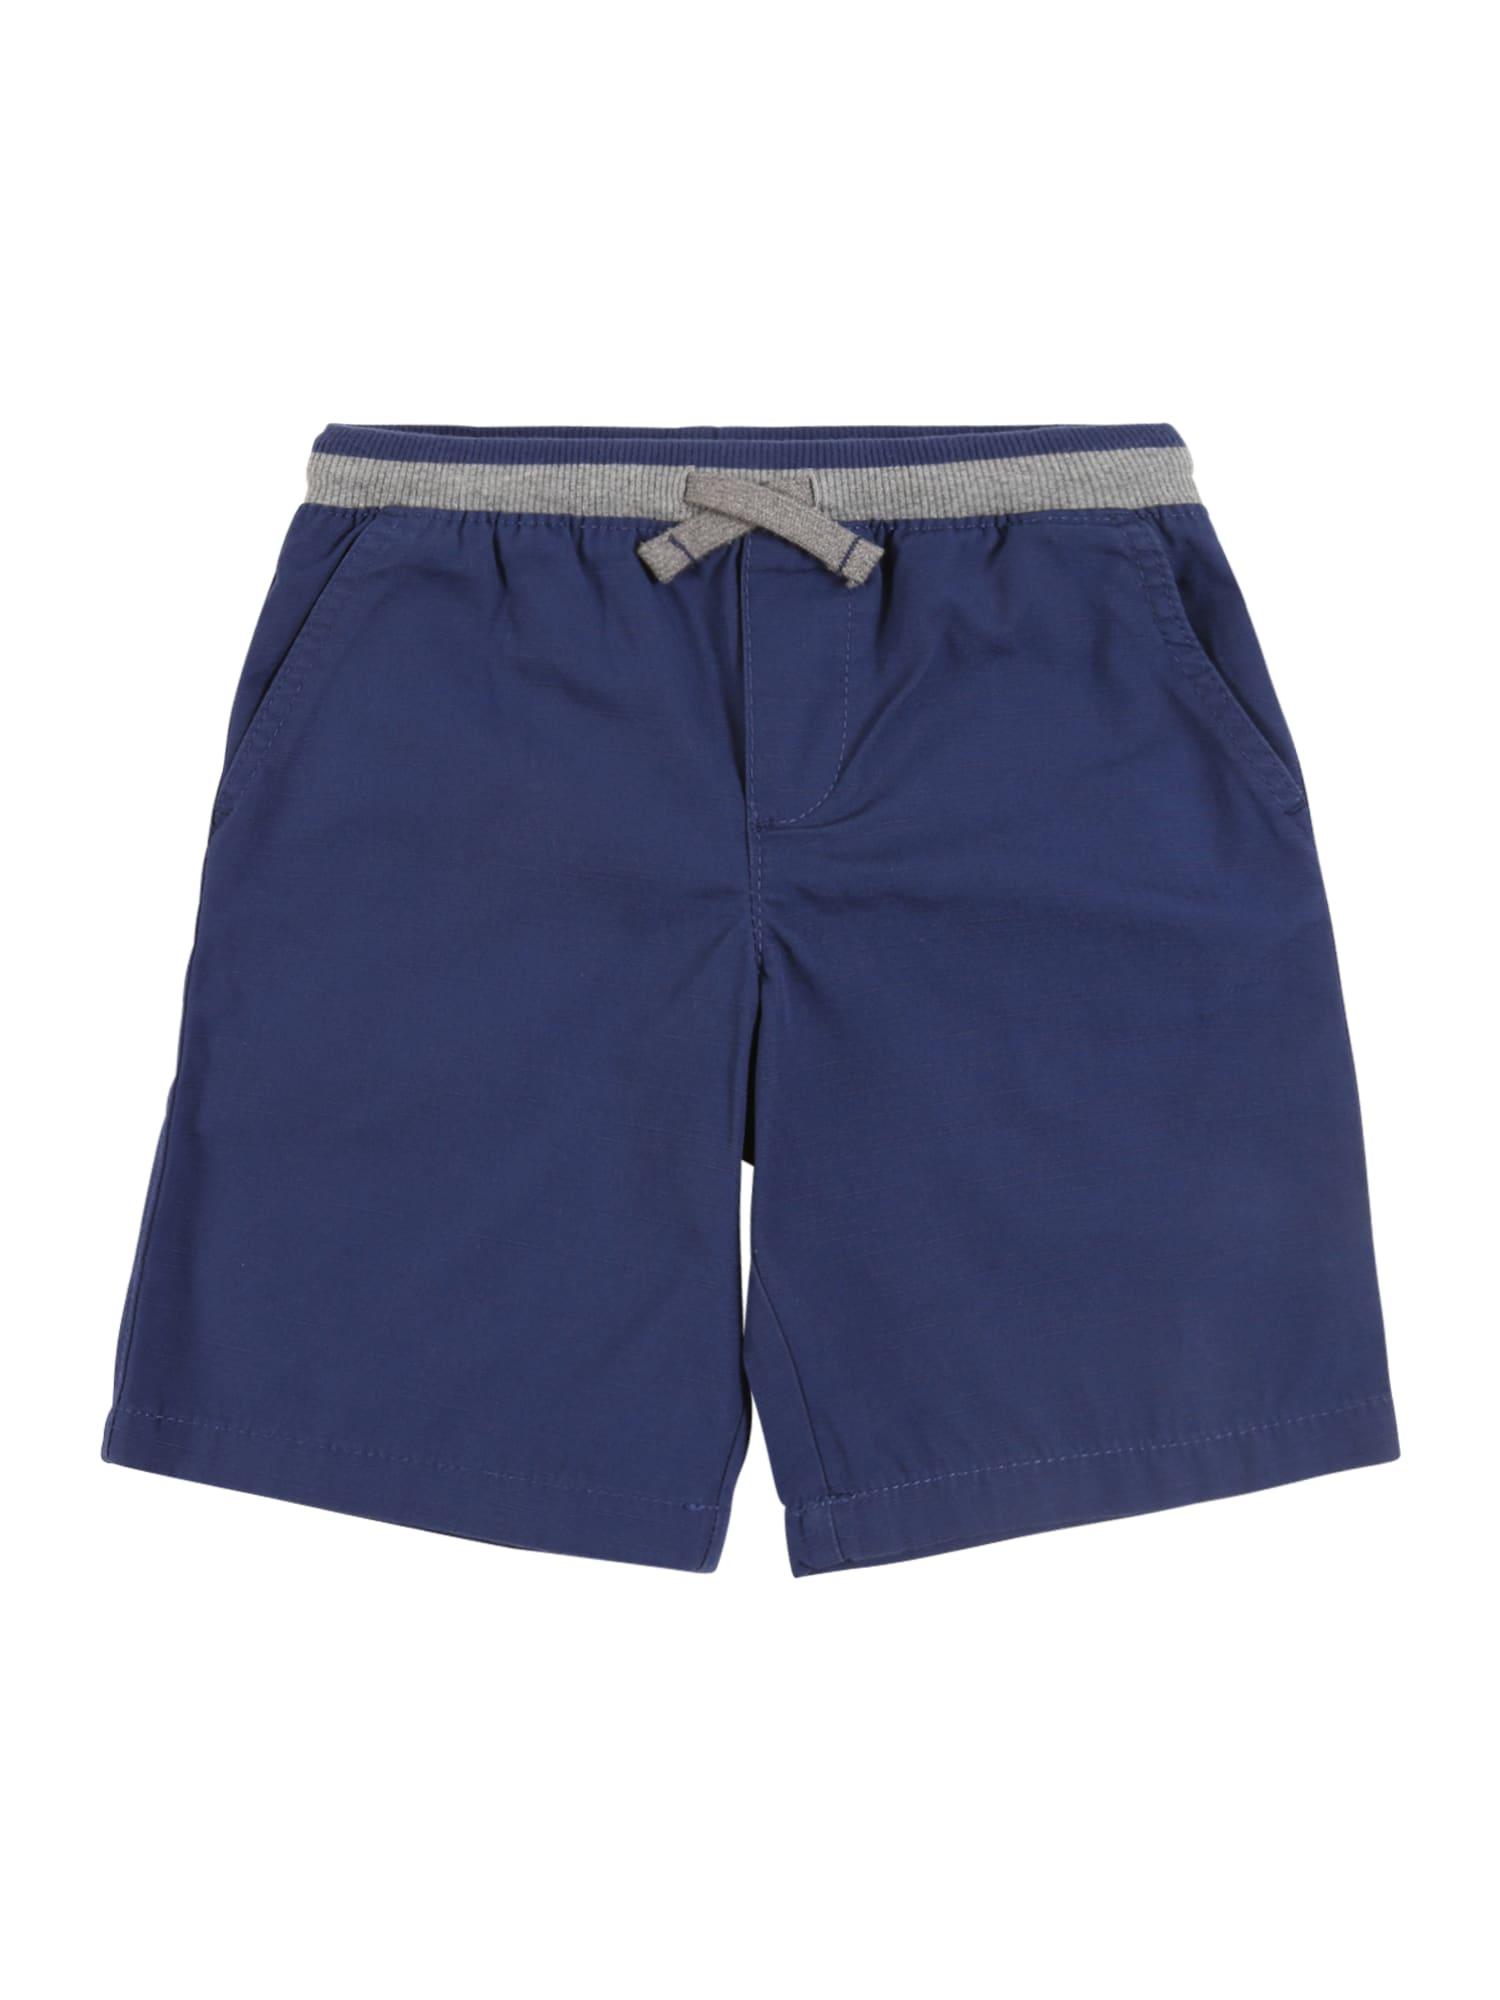 Carter's Kelnės 'Feb Super Table S20 navy dock short' tamsiai mėlyna / pilka